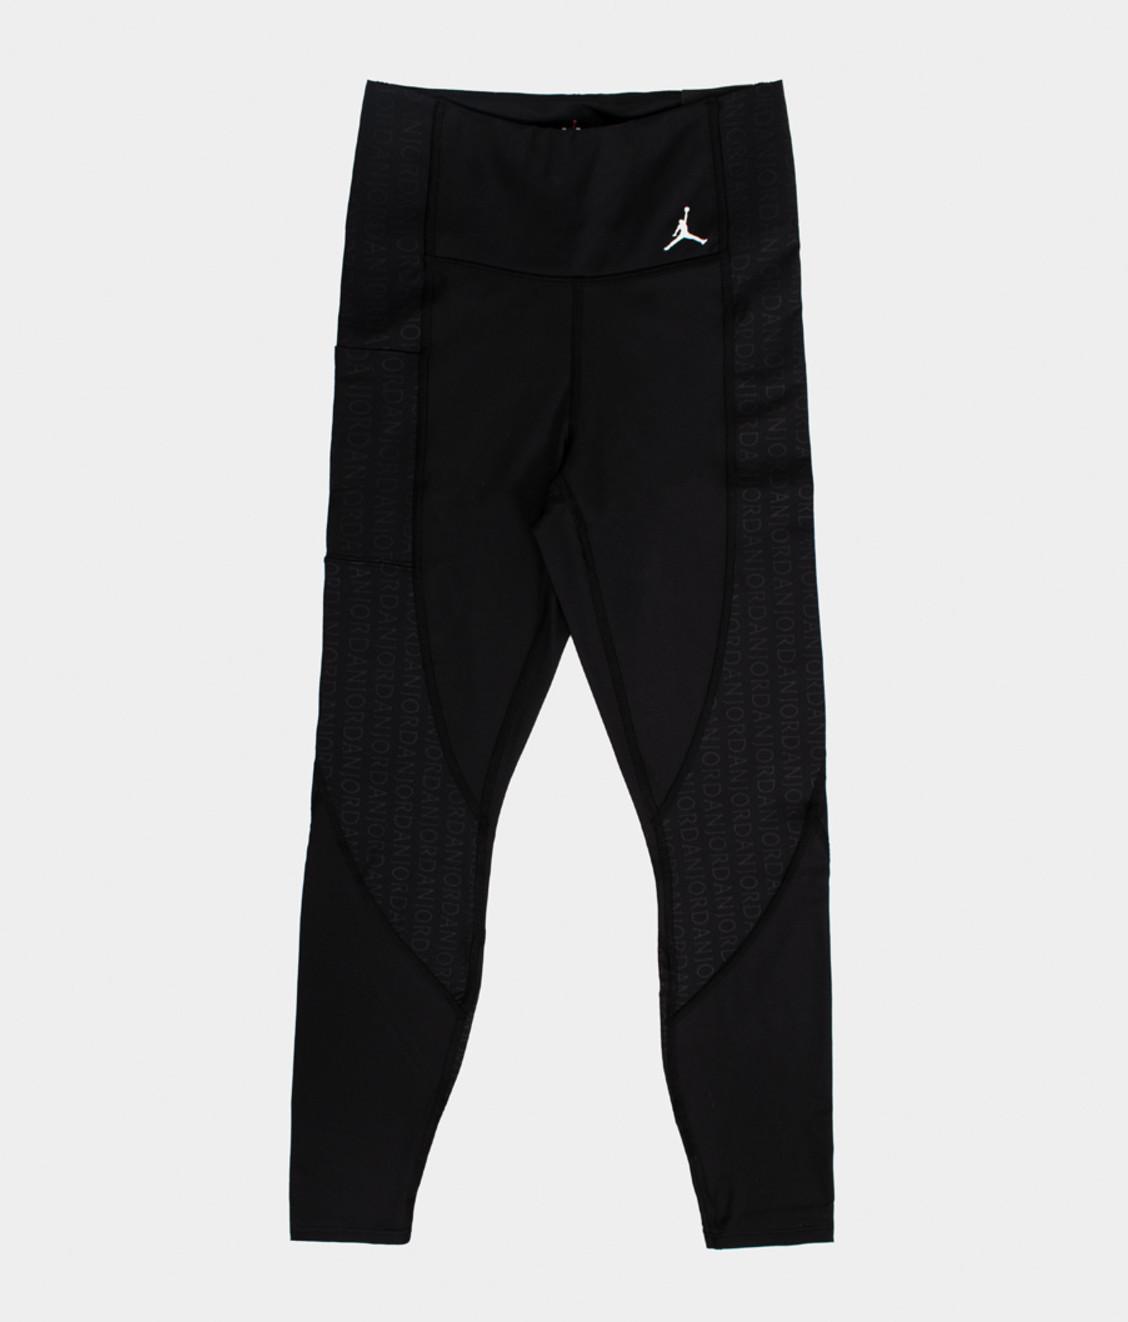 Nike Jordan Legging Black